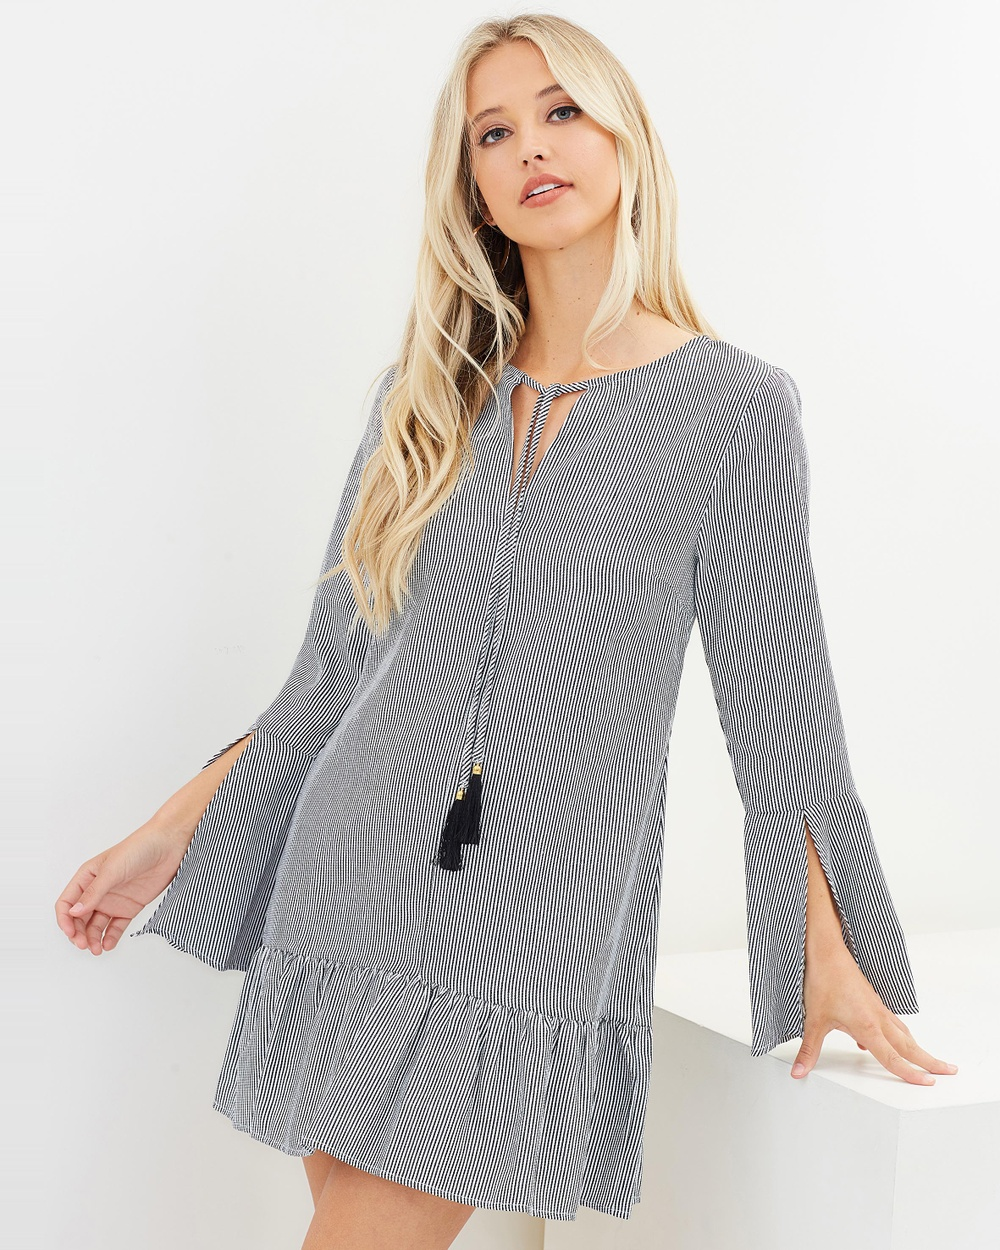 Dazie Black & White Rihana Frill Hem Dress